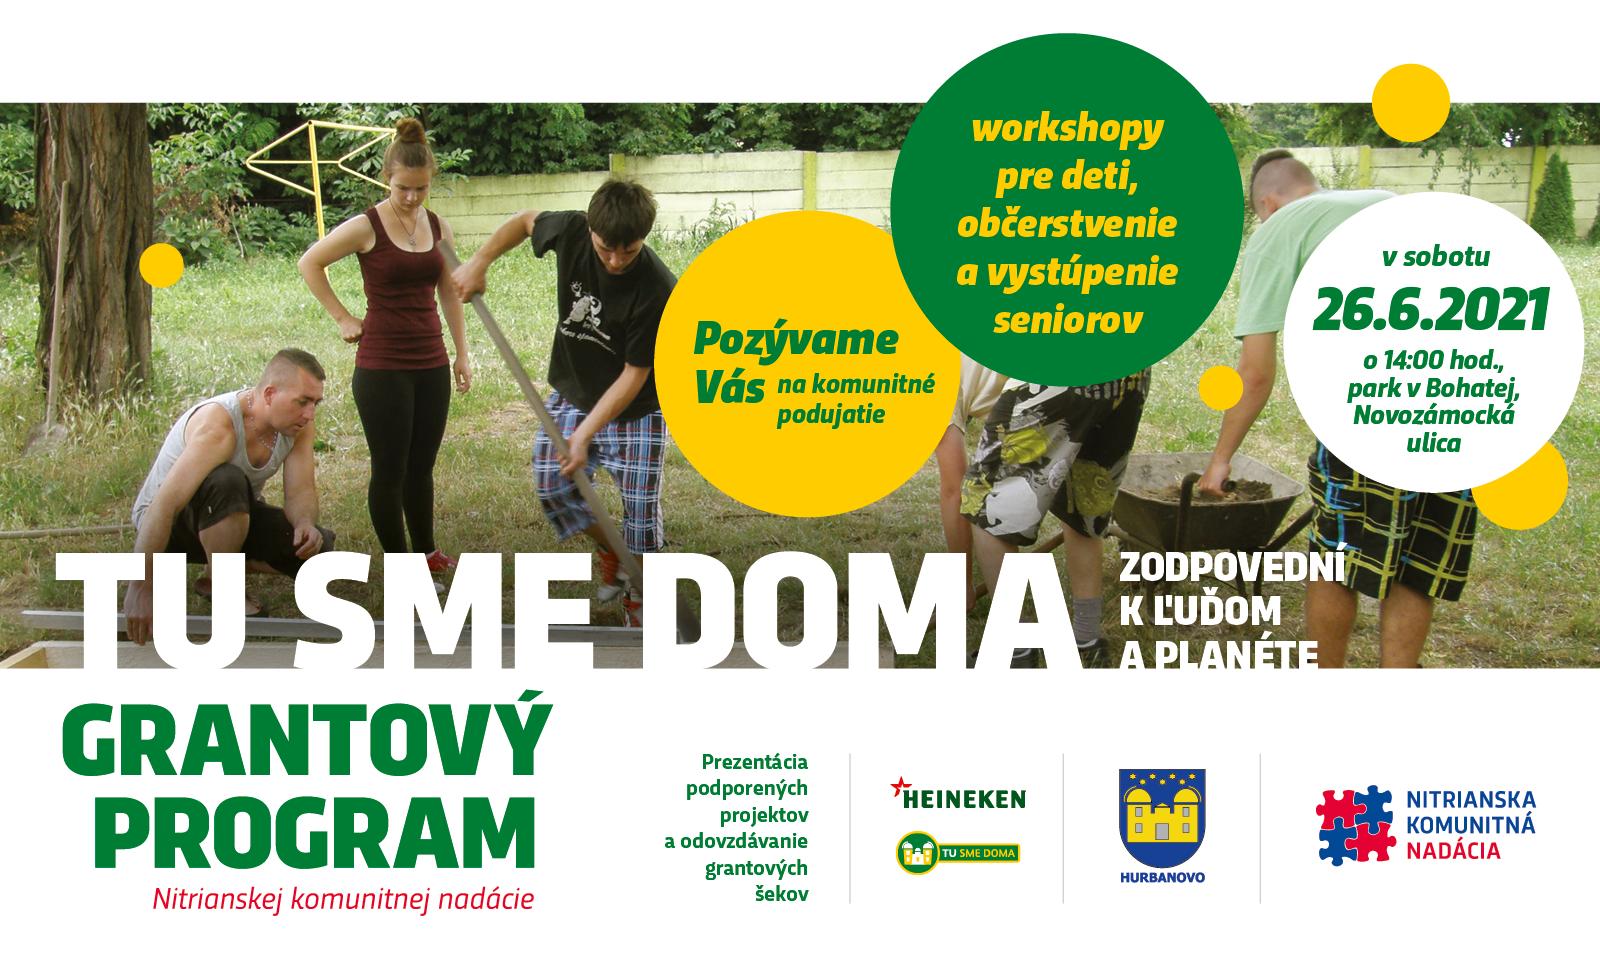 web banner 1600x980px GP Hurbanovo Tusmedoma pozvanka ok1